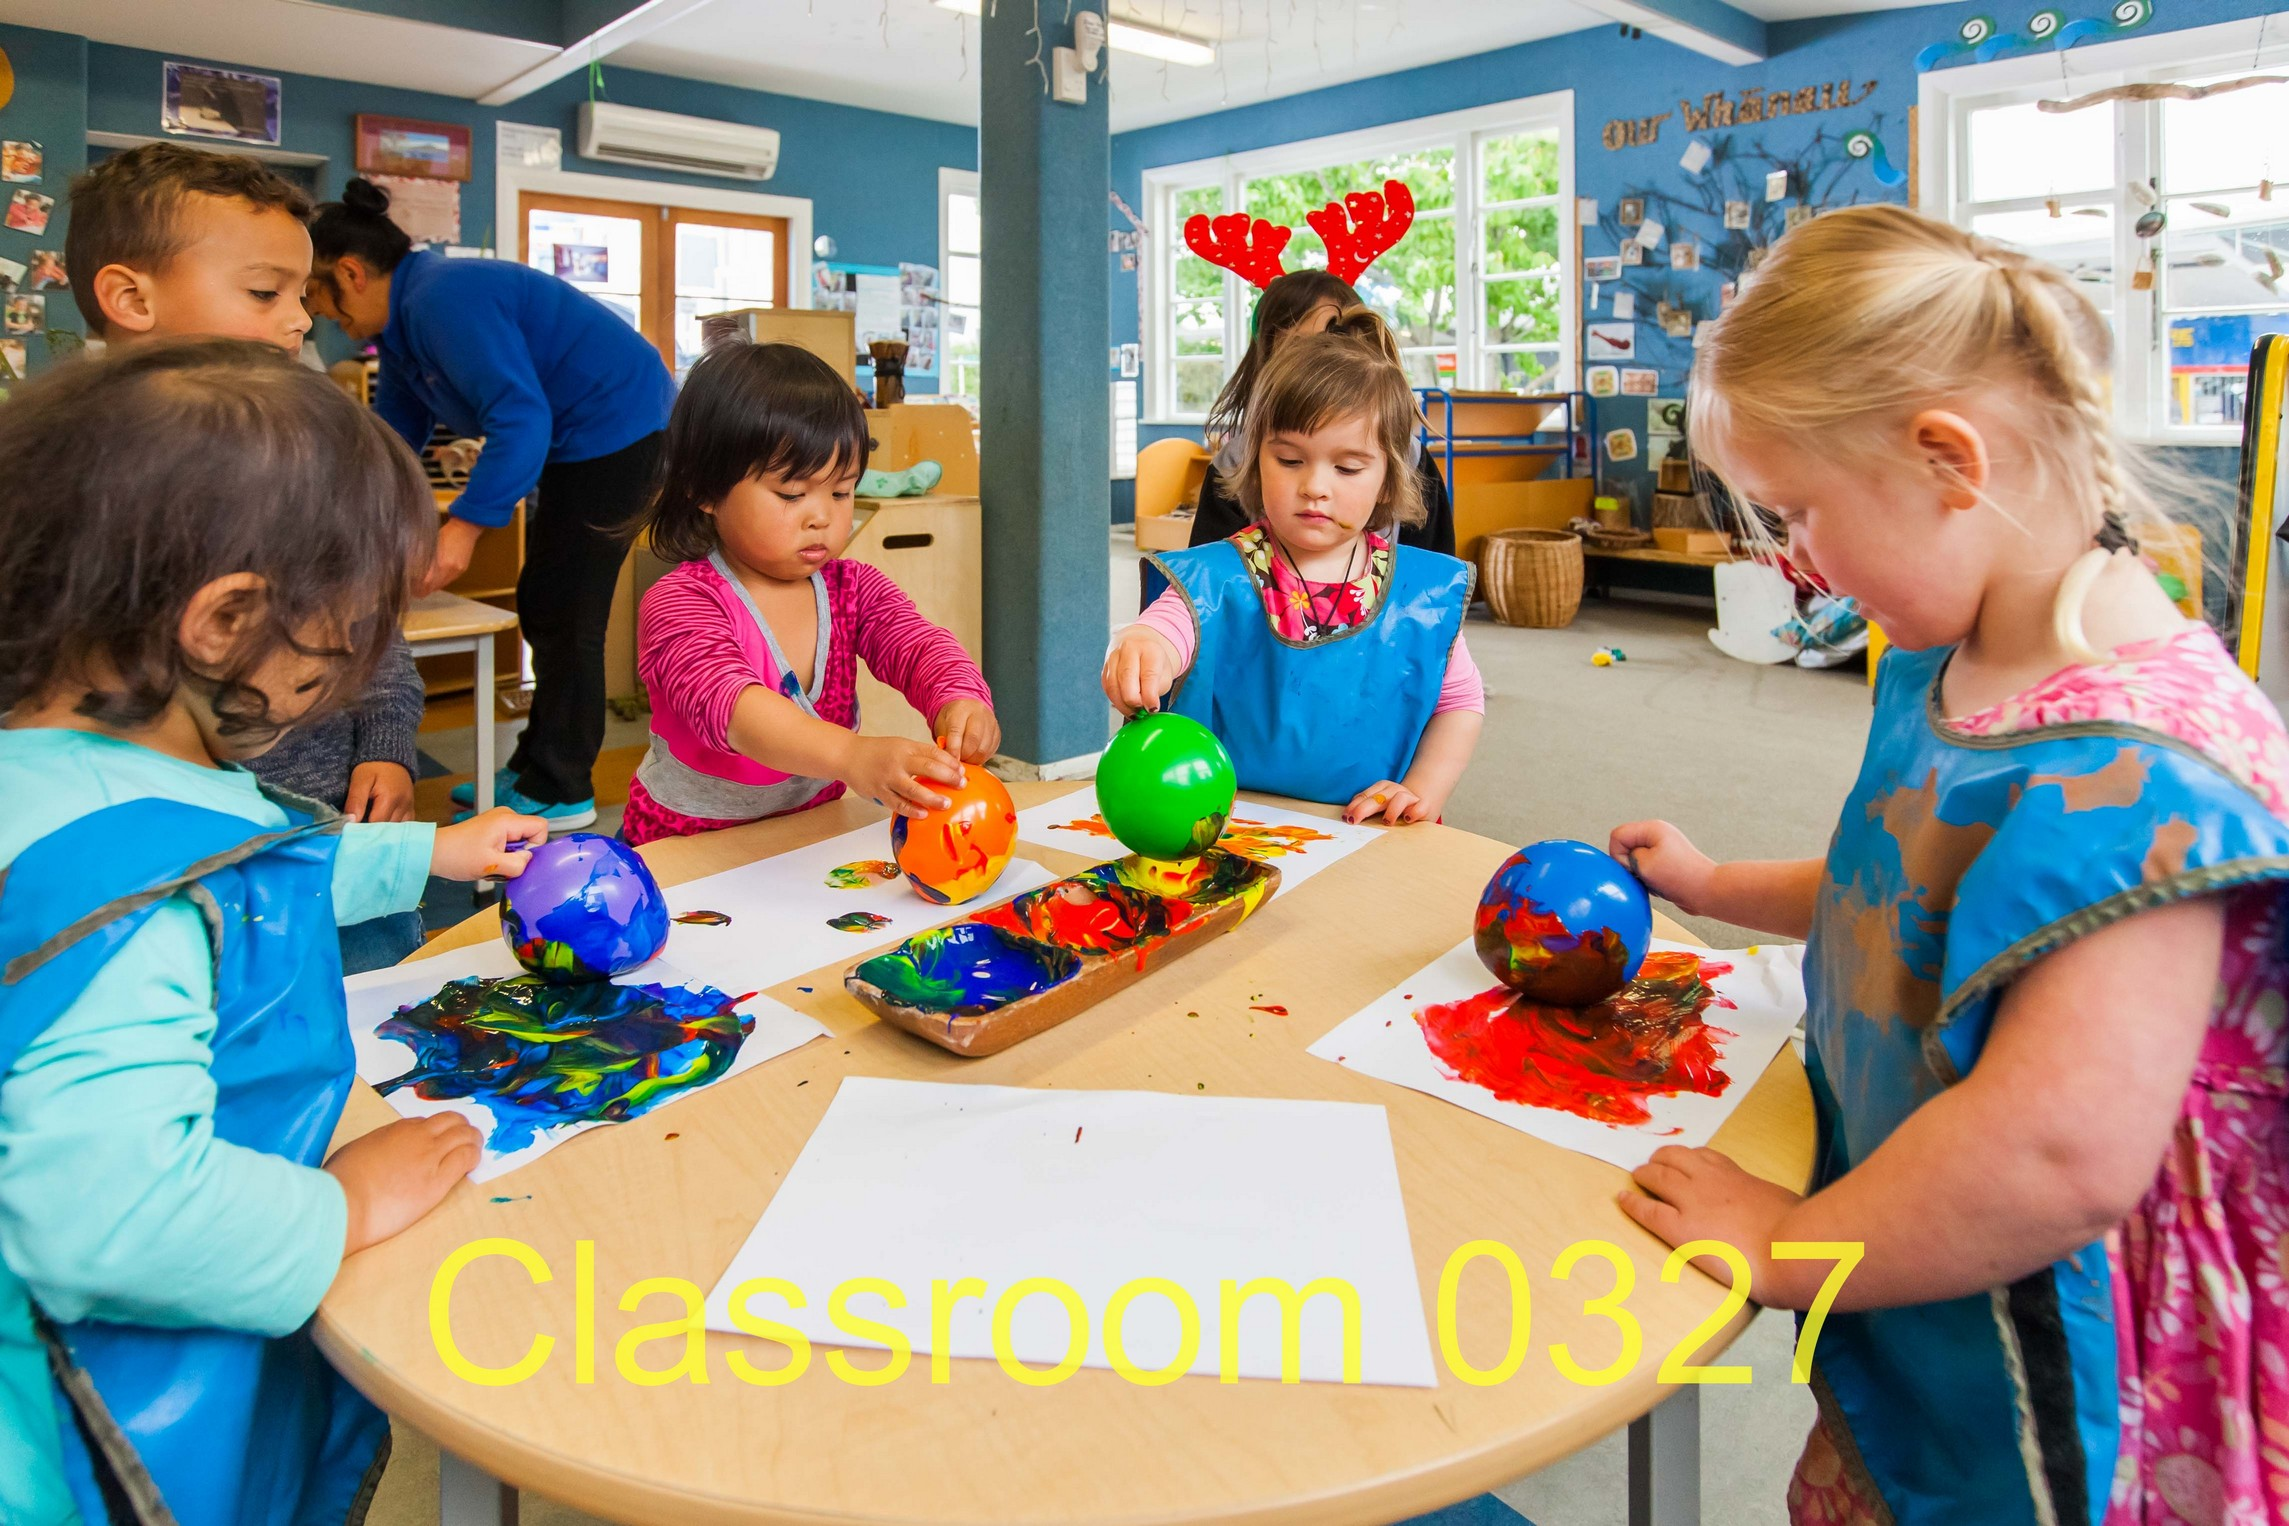 Classroom 0327